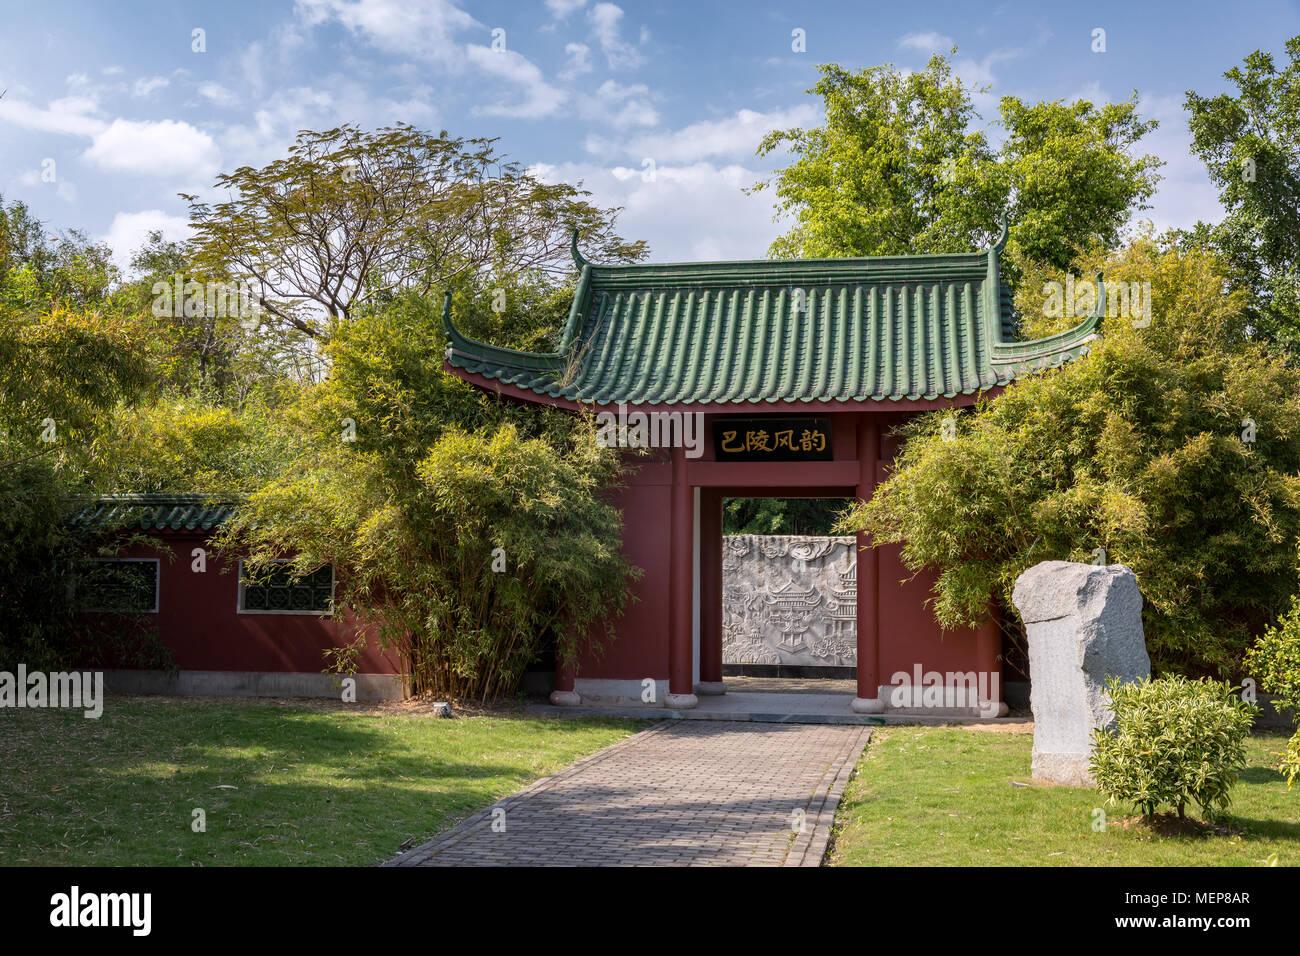 La entrada a un templo chino, Xiamen International Garden & Flower Expo Park, Distrito Jimei, Xiamen, Fujian, China Foto de stock